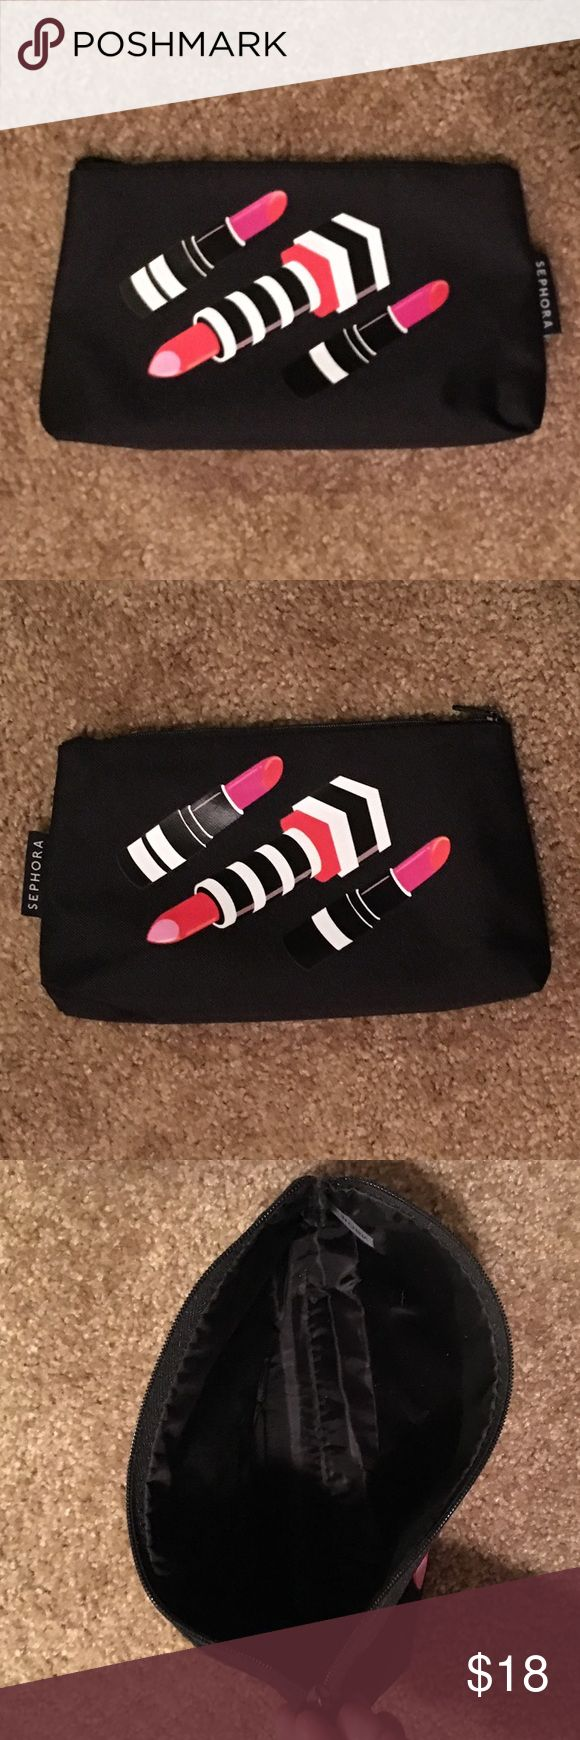 Sephora Lipstick Print Makeup Bag Brand New Never Used Sephora Brand Lipstick Print  Make-Up Bag with nylon interior Sephora Bags Cosmetic Bags & Cases